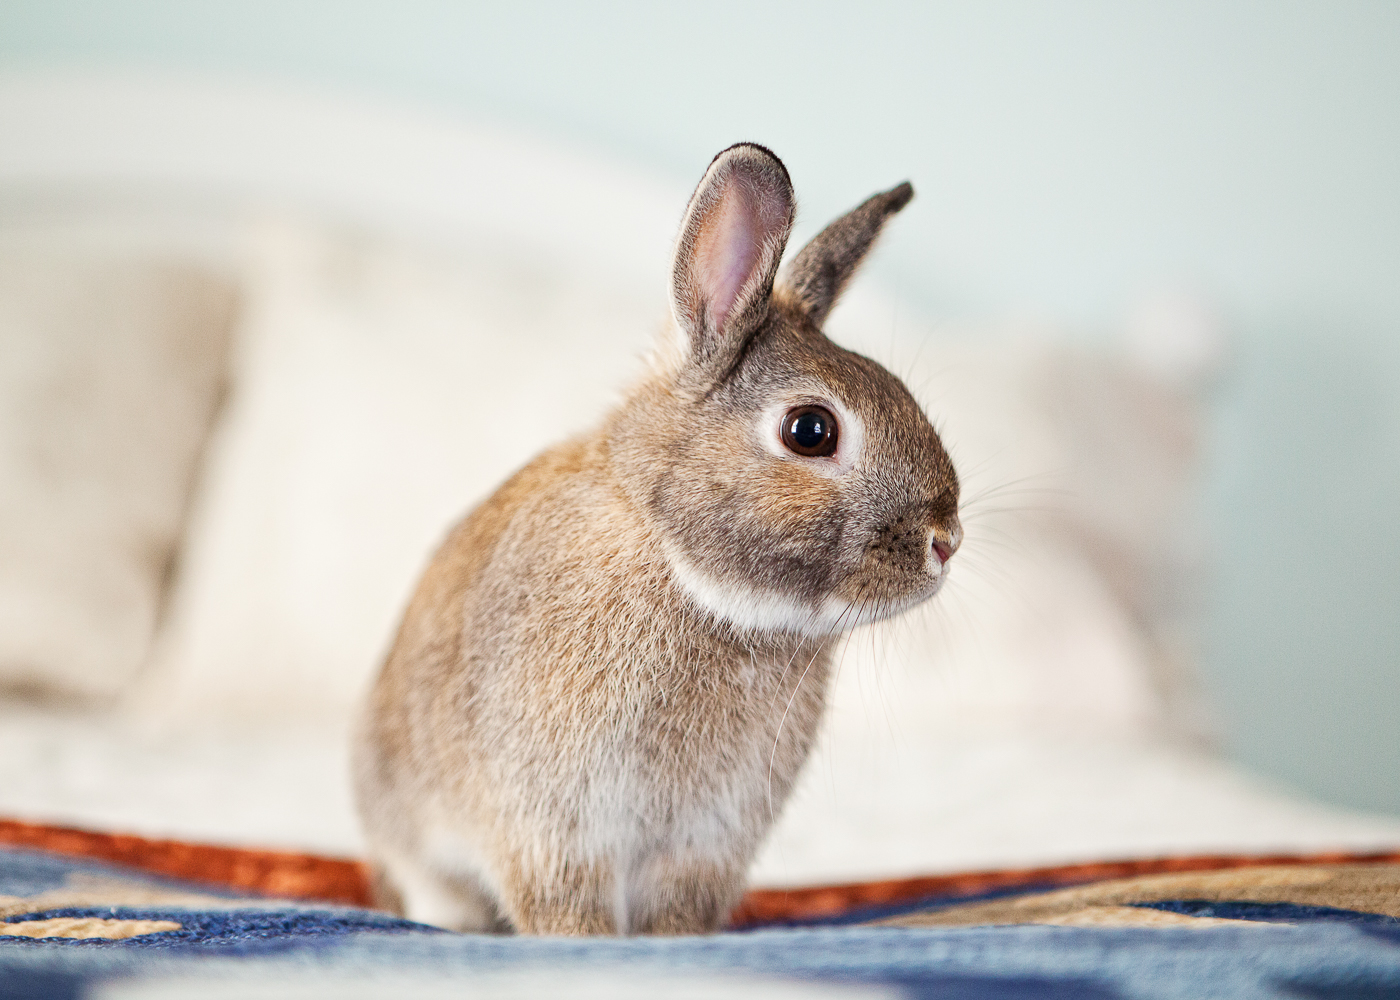 boulder house rabbit photos008.jpg